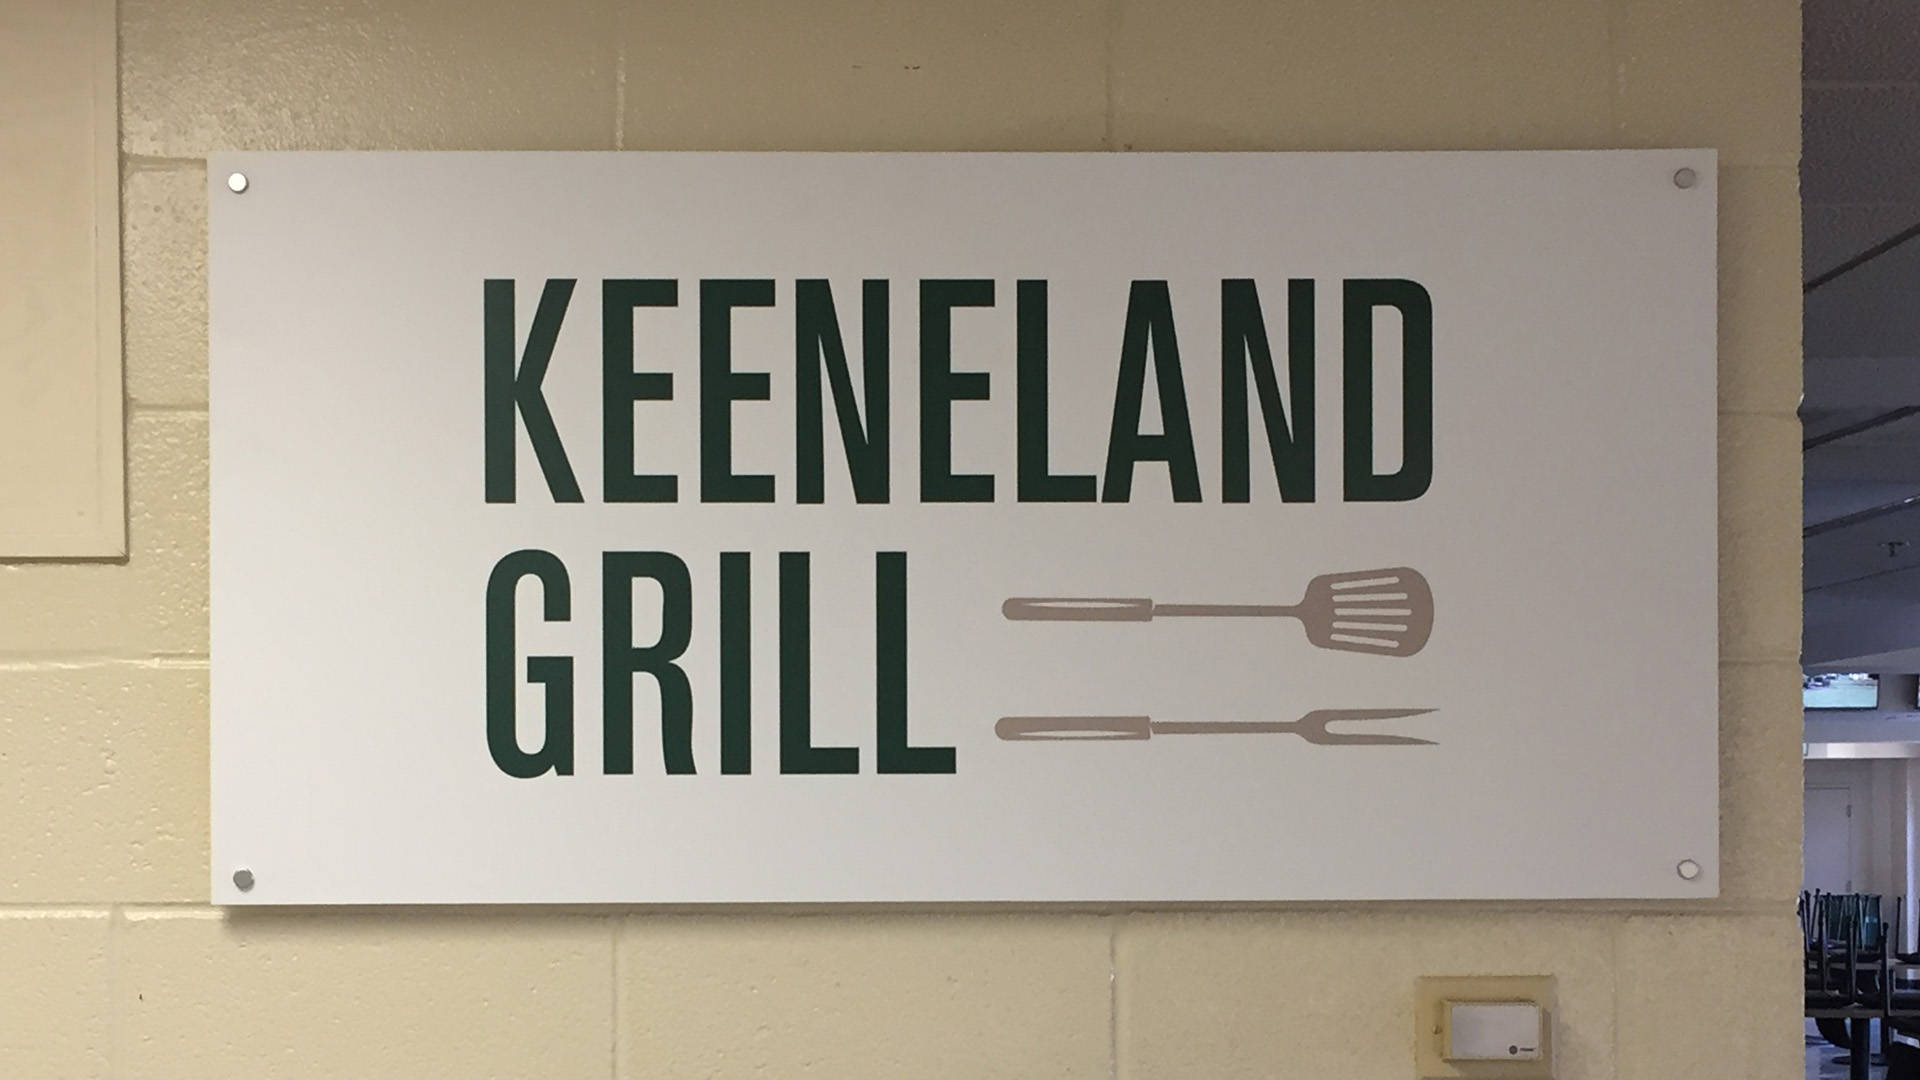 Keeneland Grills signage